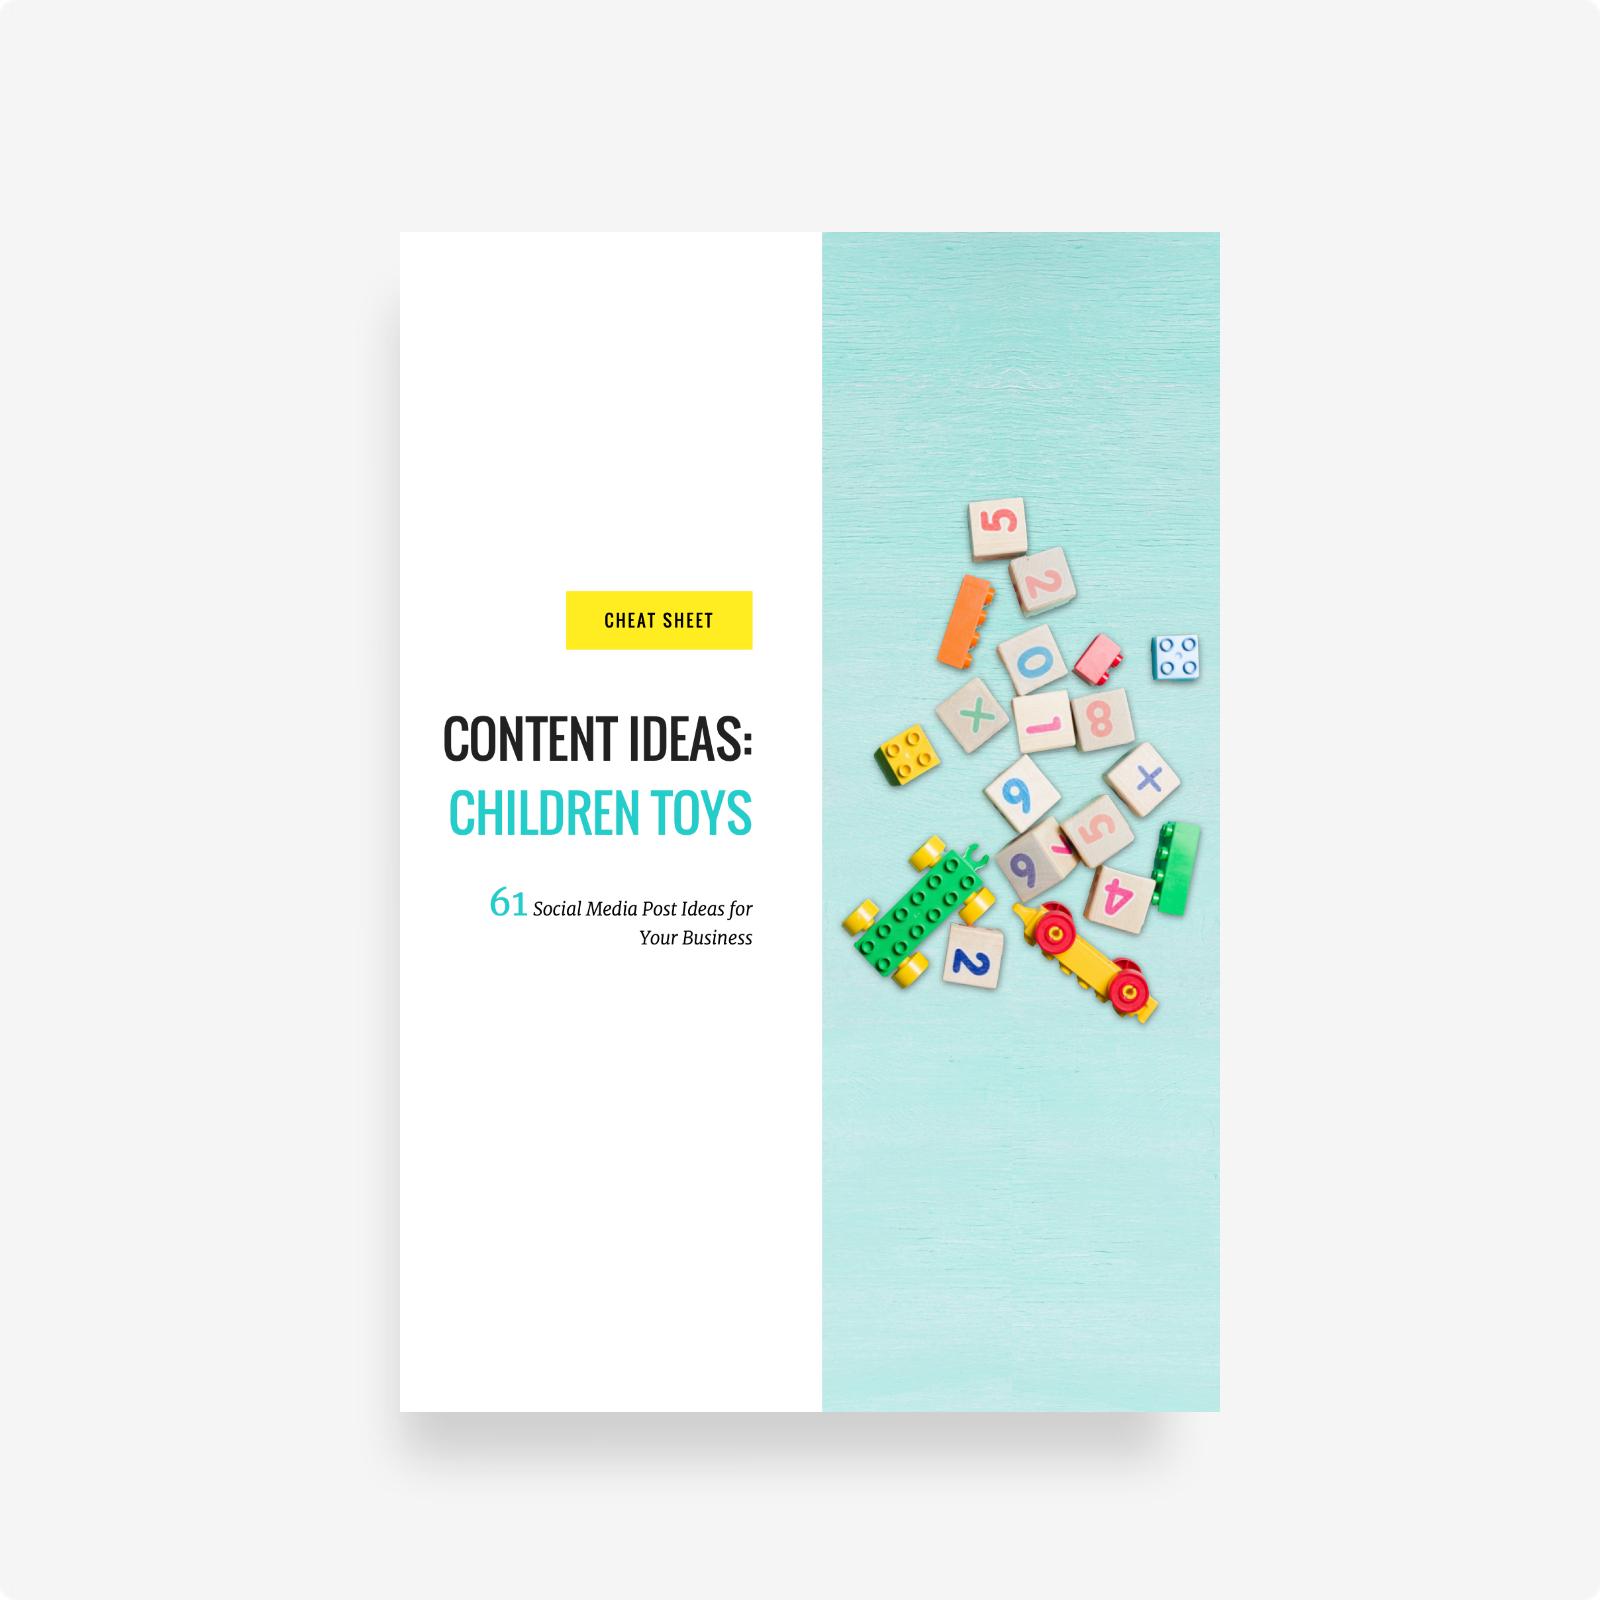 davaii-61-content-ideas-for-children-toys